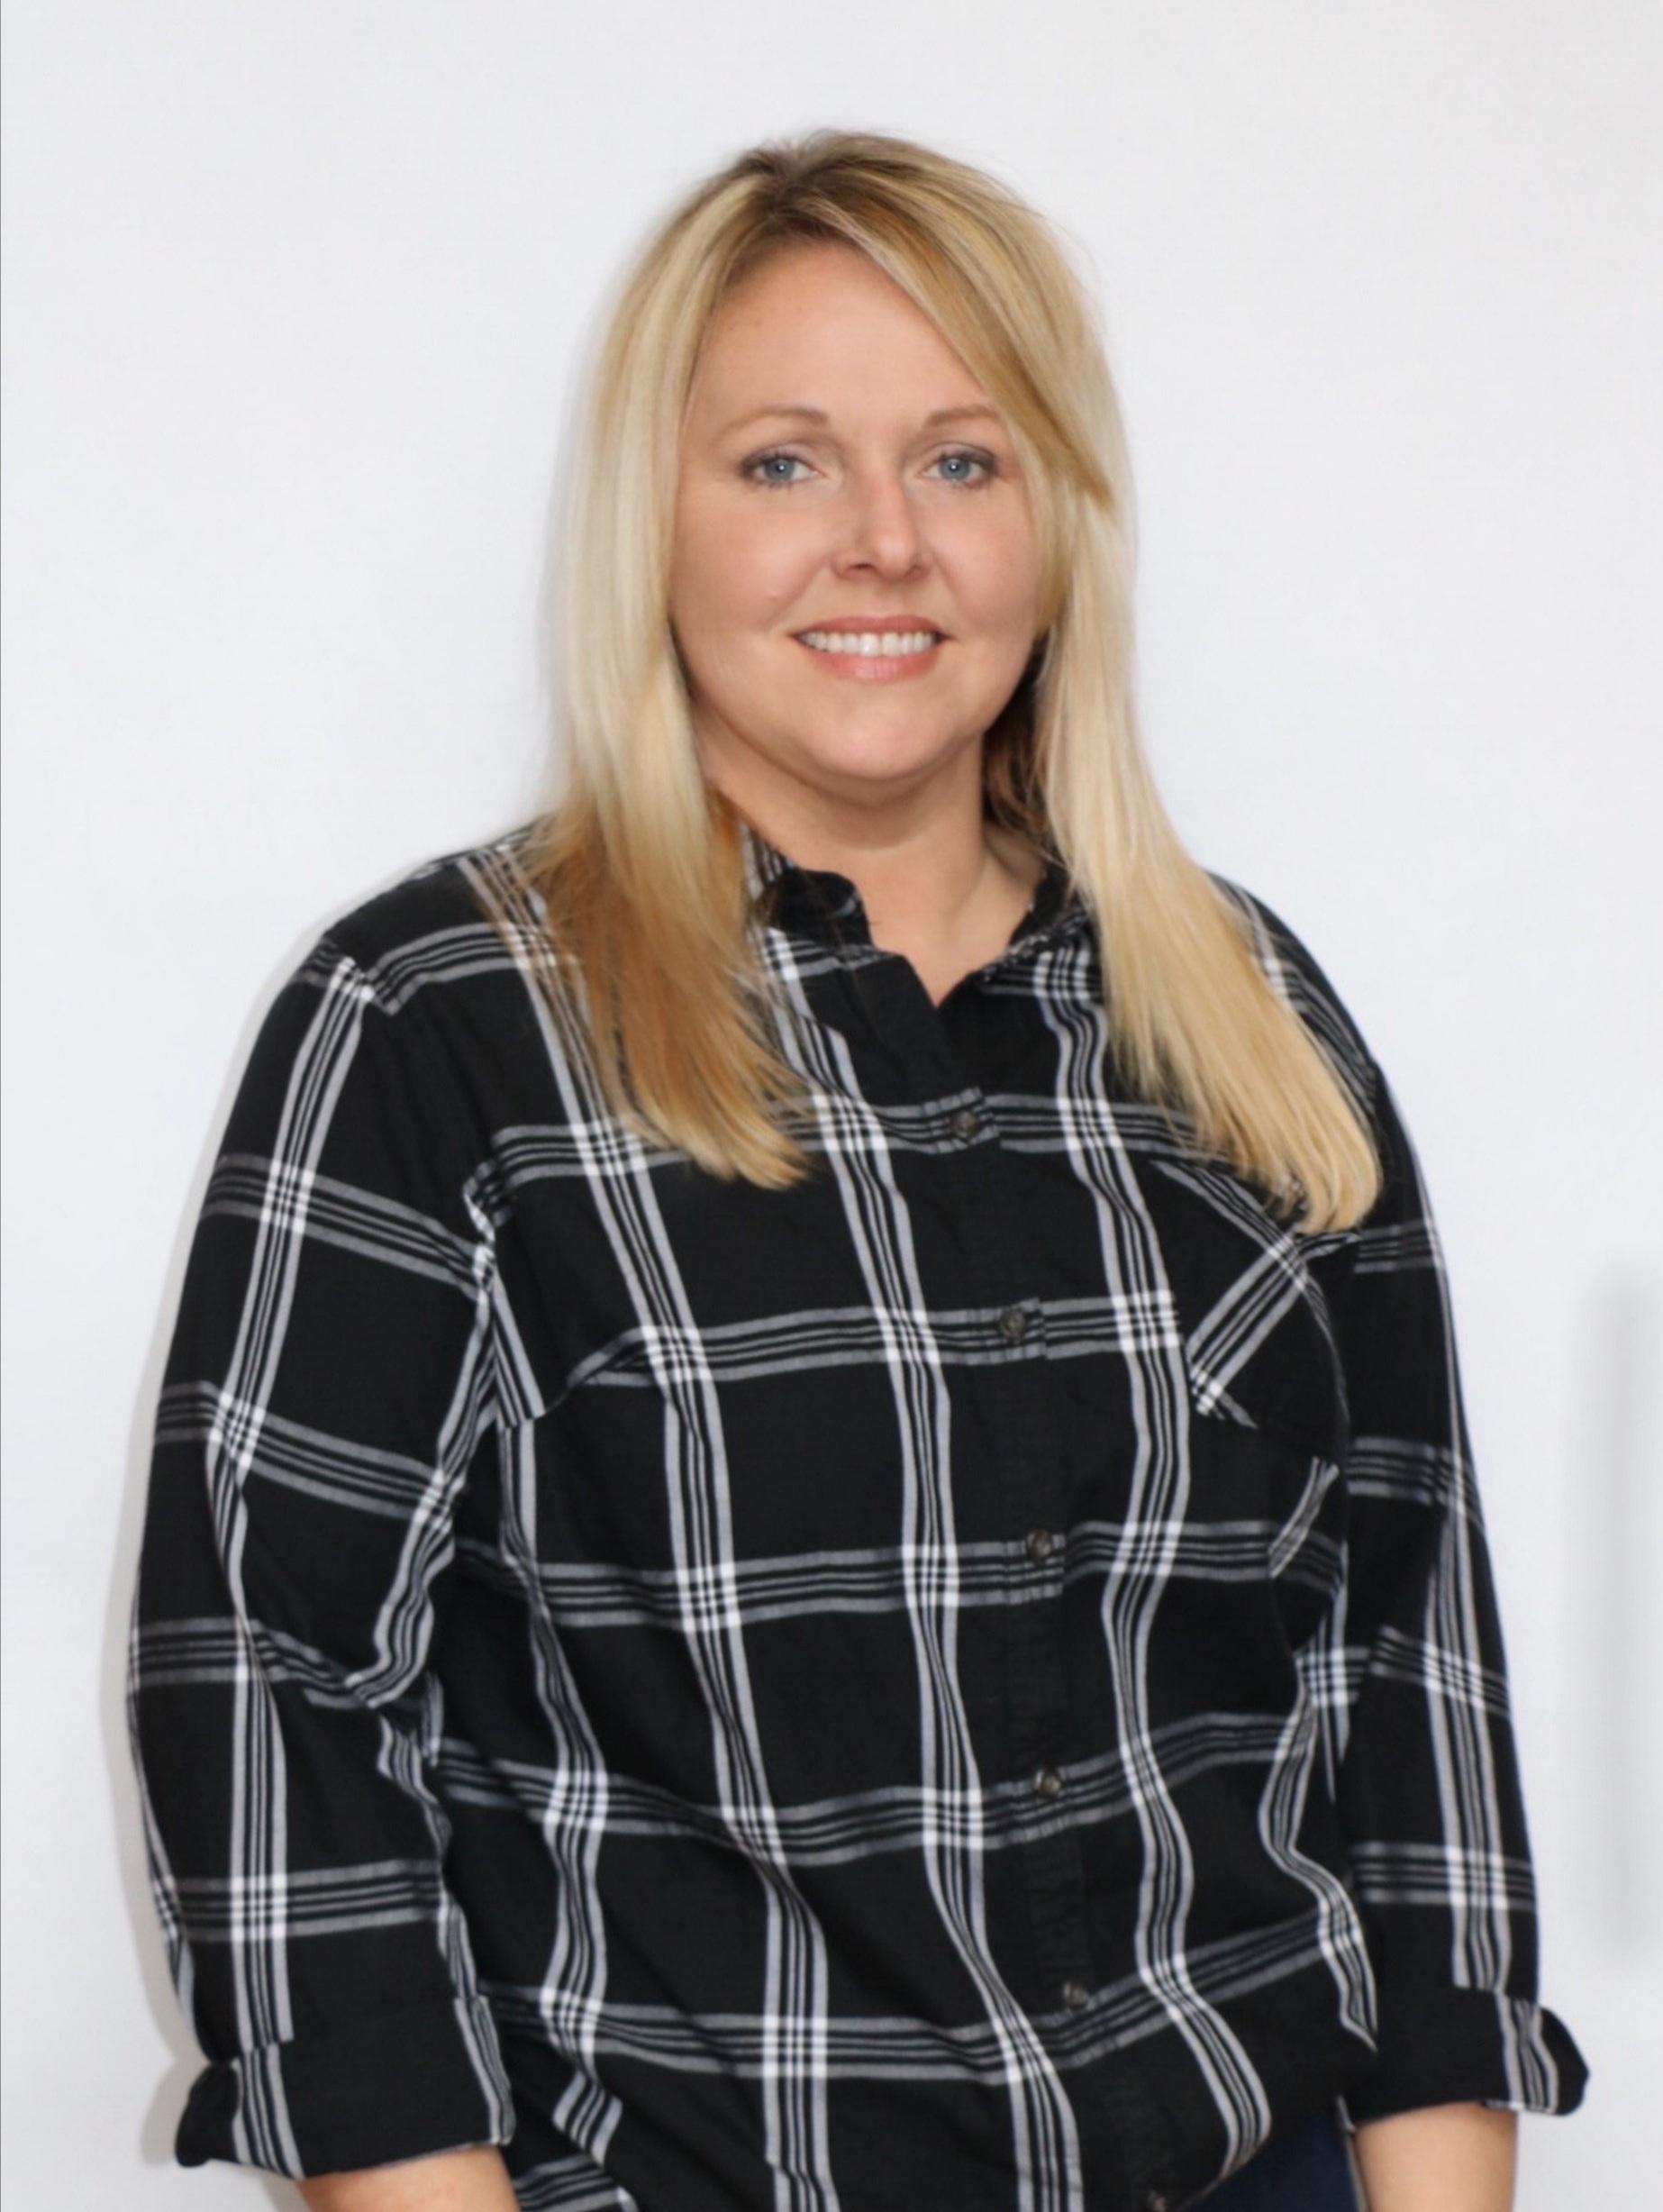 Mandy Hausladen